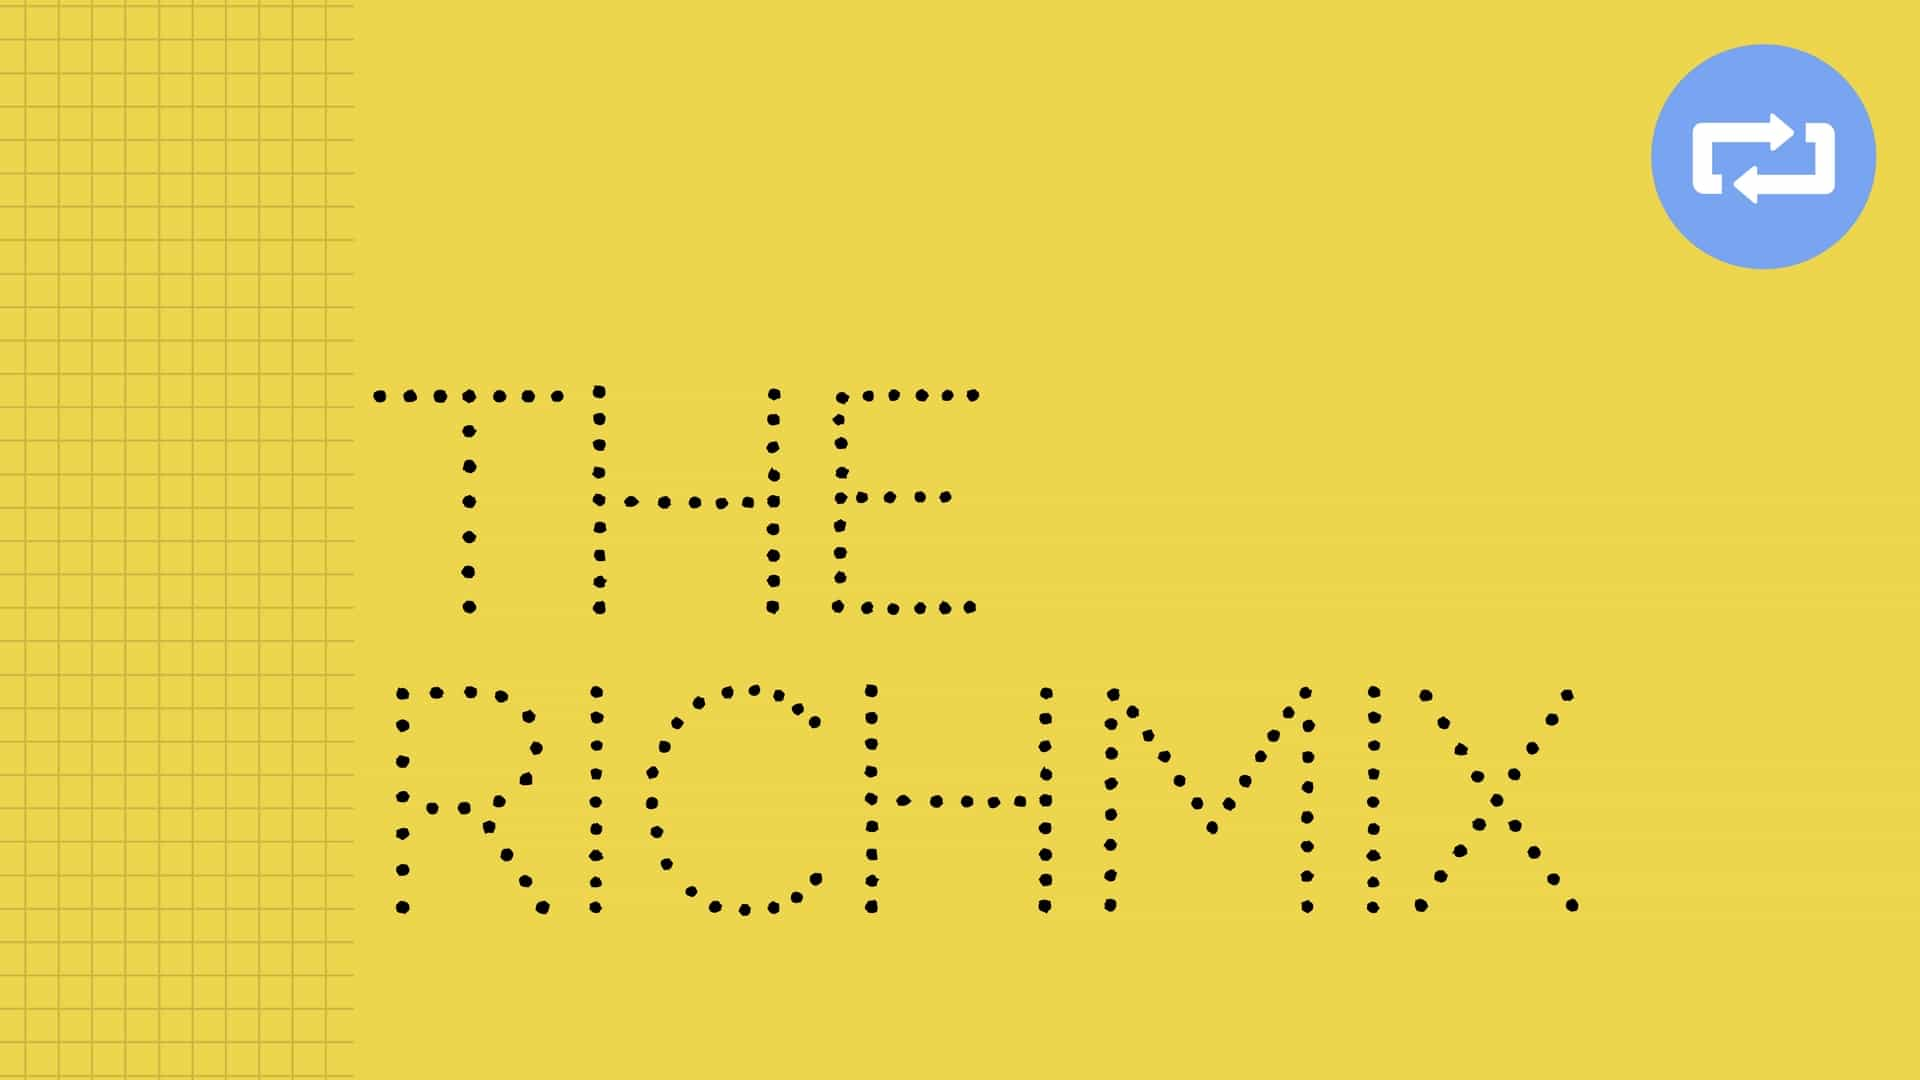 The Richmix